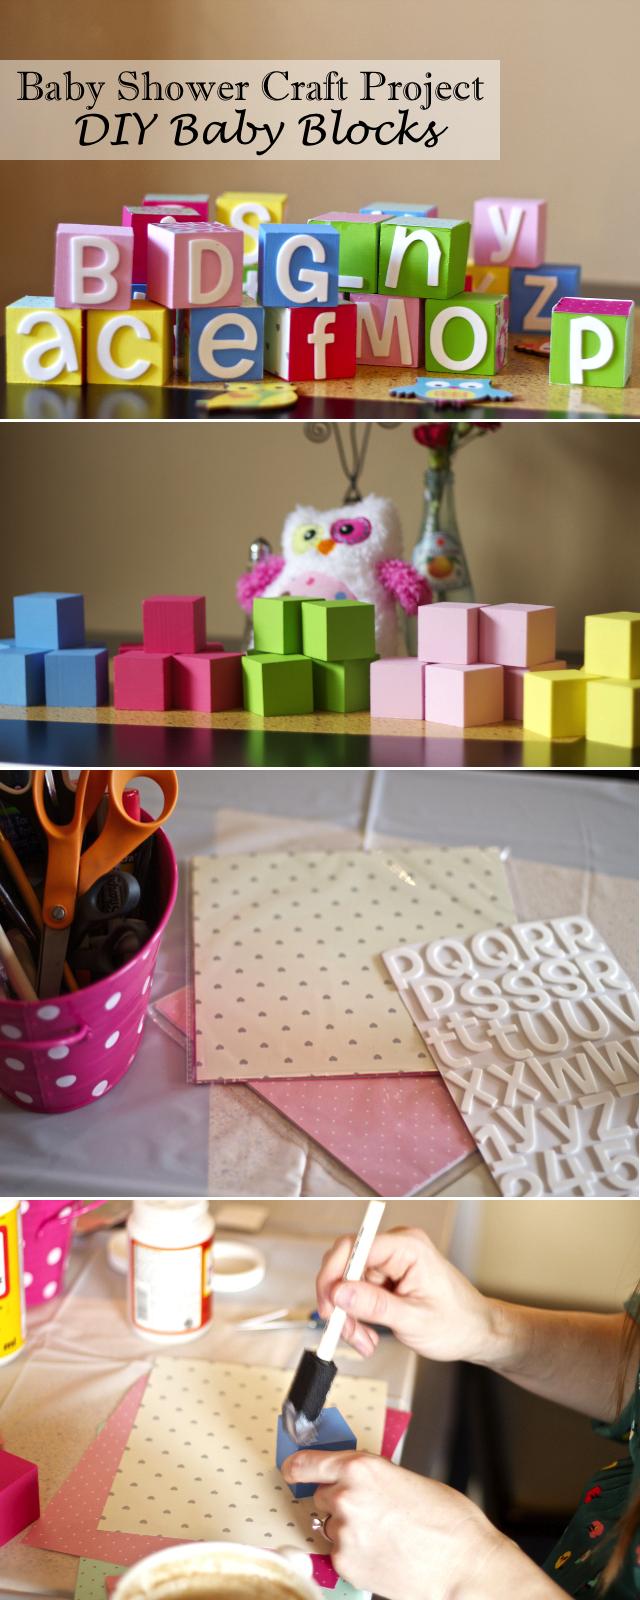 craft ideas homemade bridal shower decoration%0A Chasing Davies  Baby Shower Craft Idea  DIY Baby Blocks